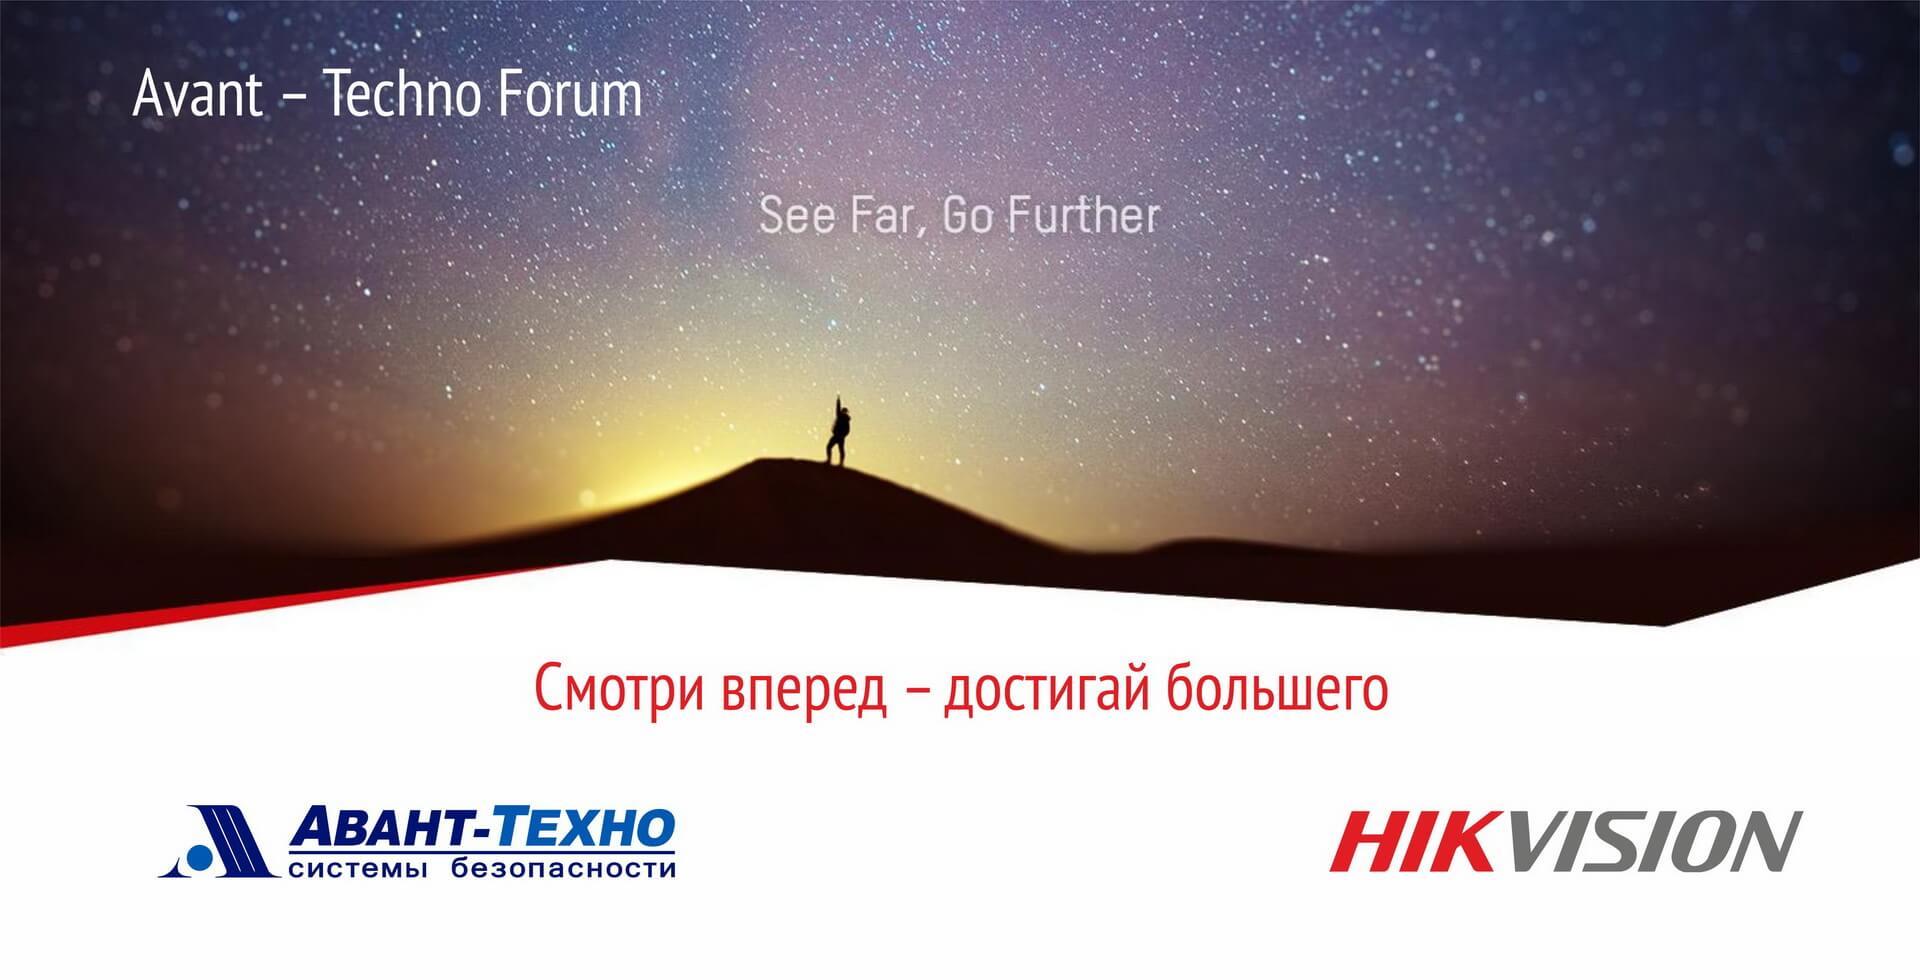 Avant Techno Forum заставка-1920px